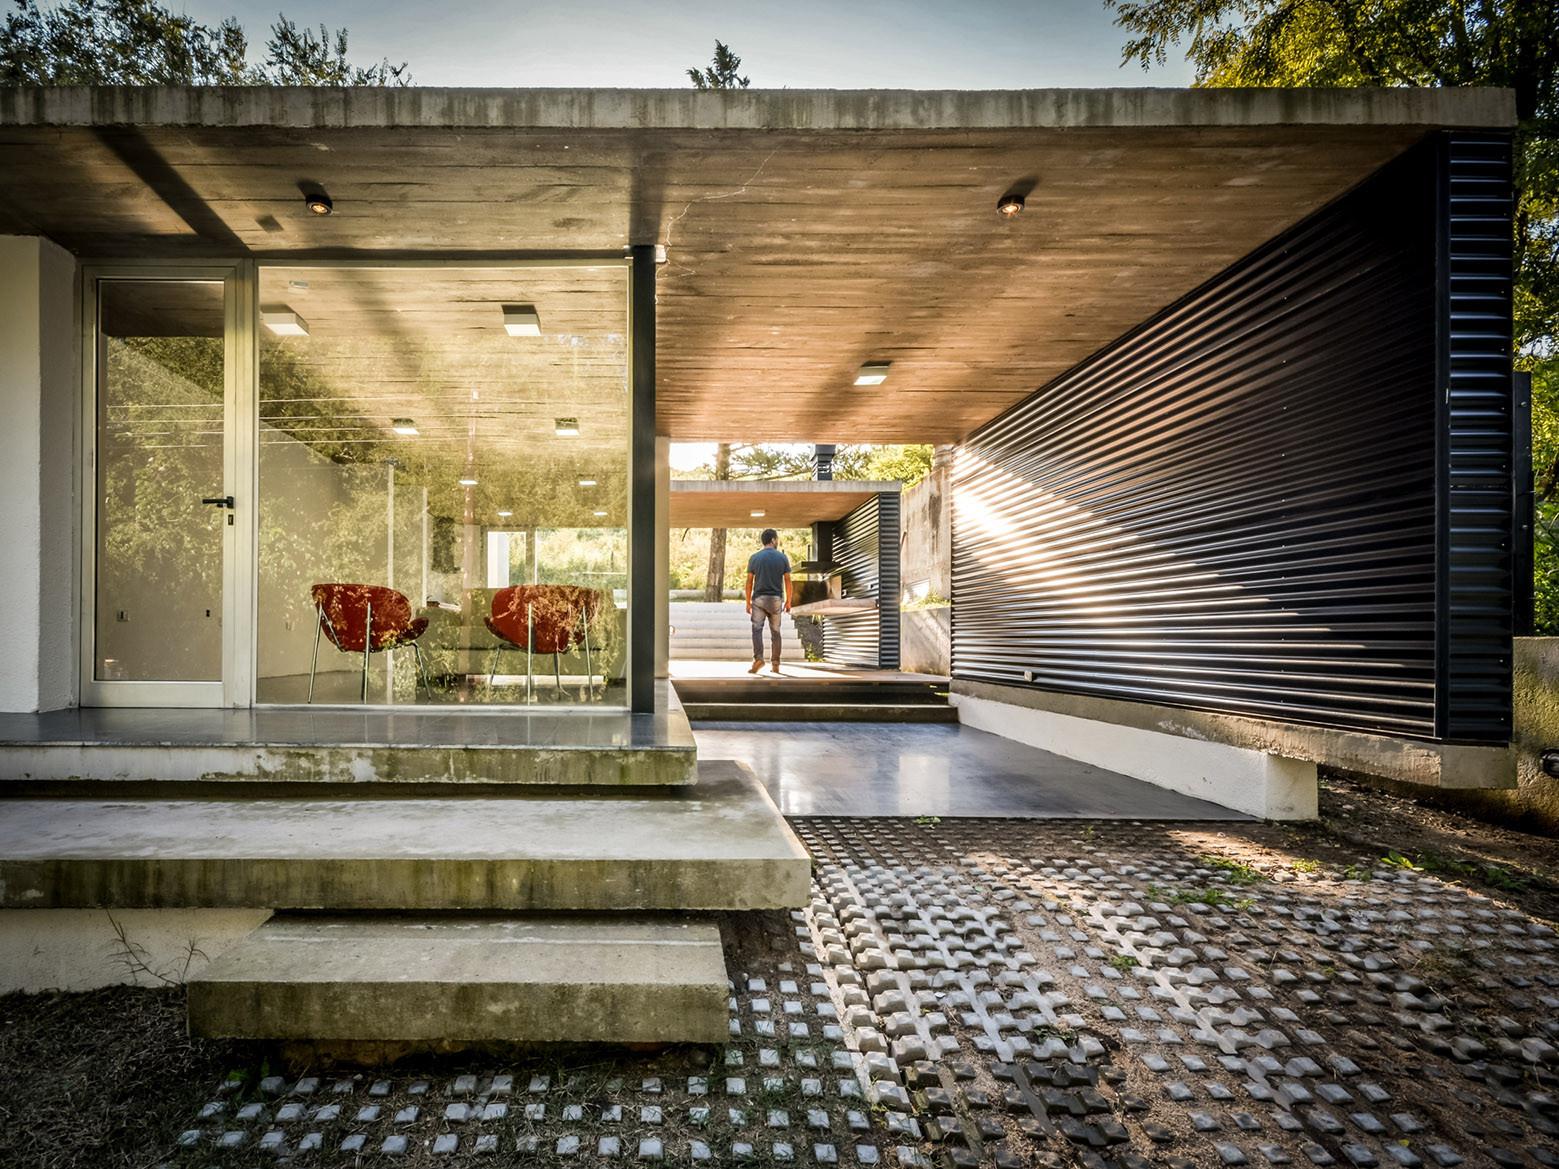 La Viña Suburban Dwelling / Juan Salassa, Santiago Tissot & Iván Castañeda, © Gonzalo Viramonte